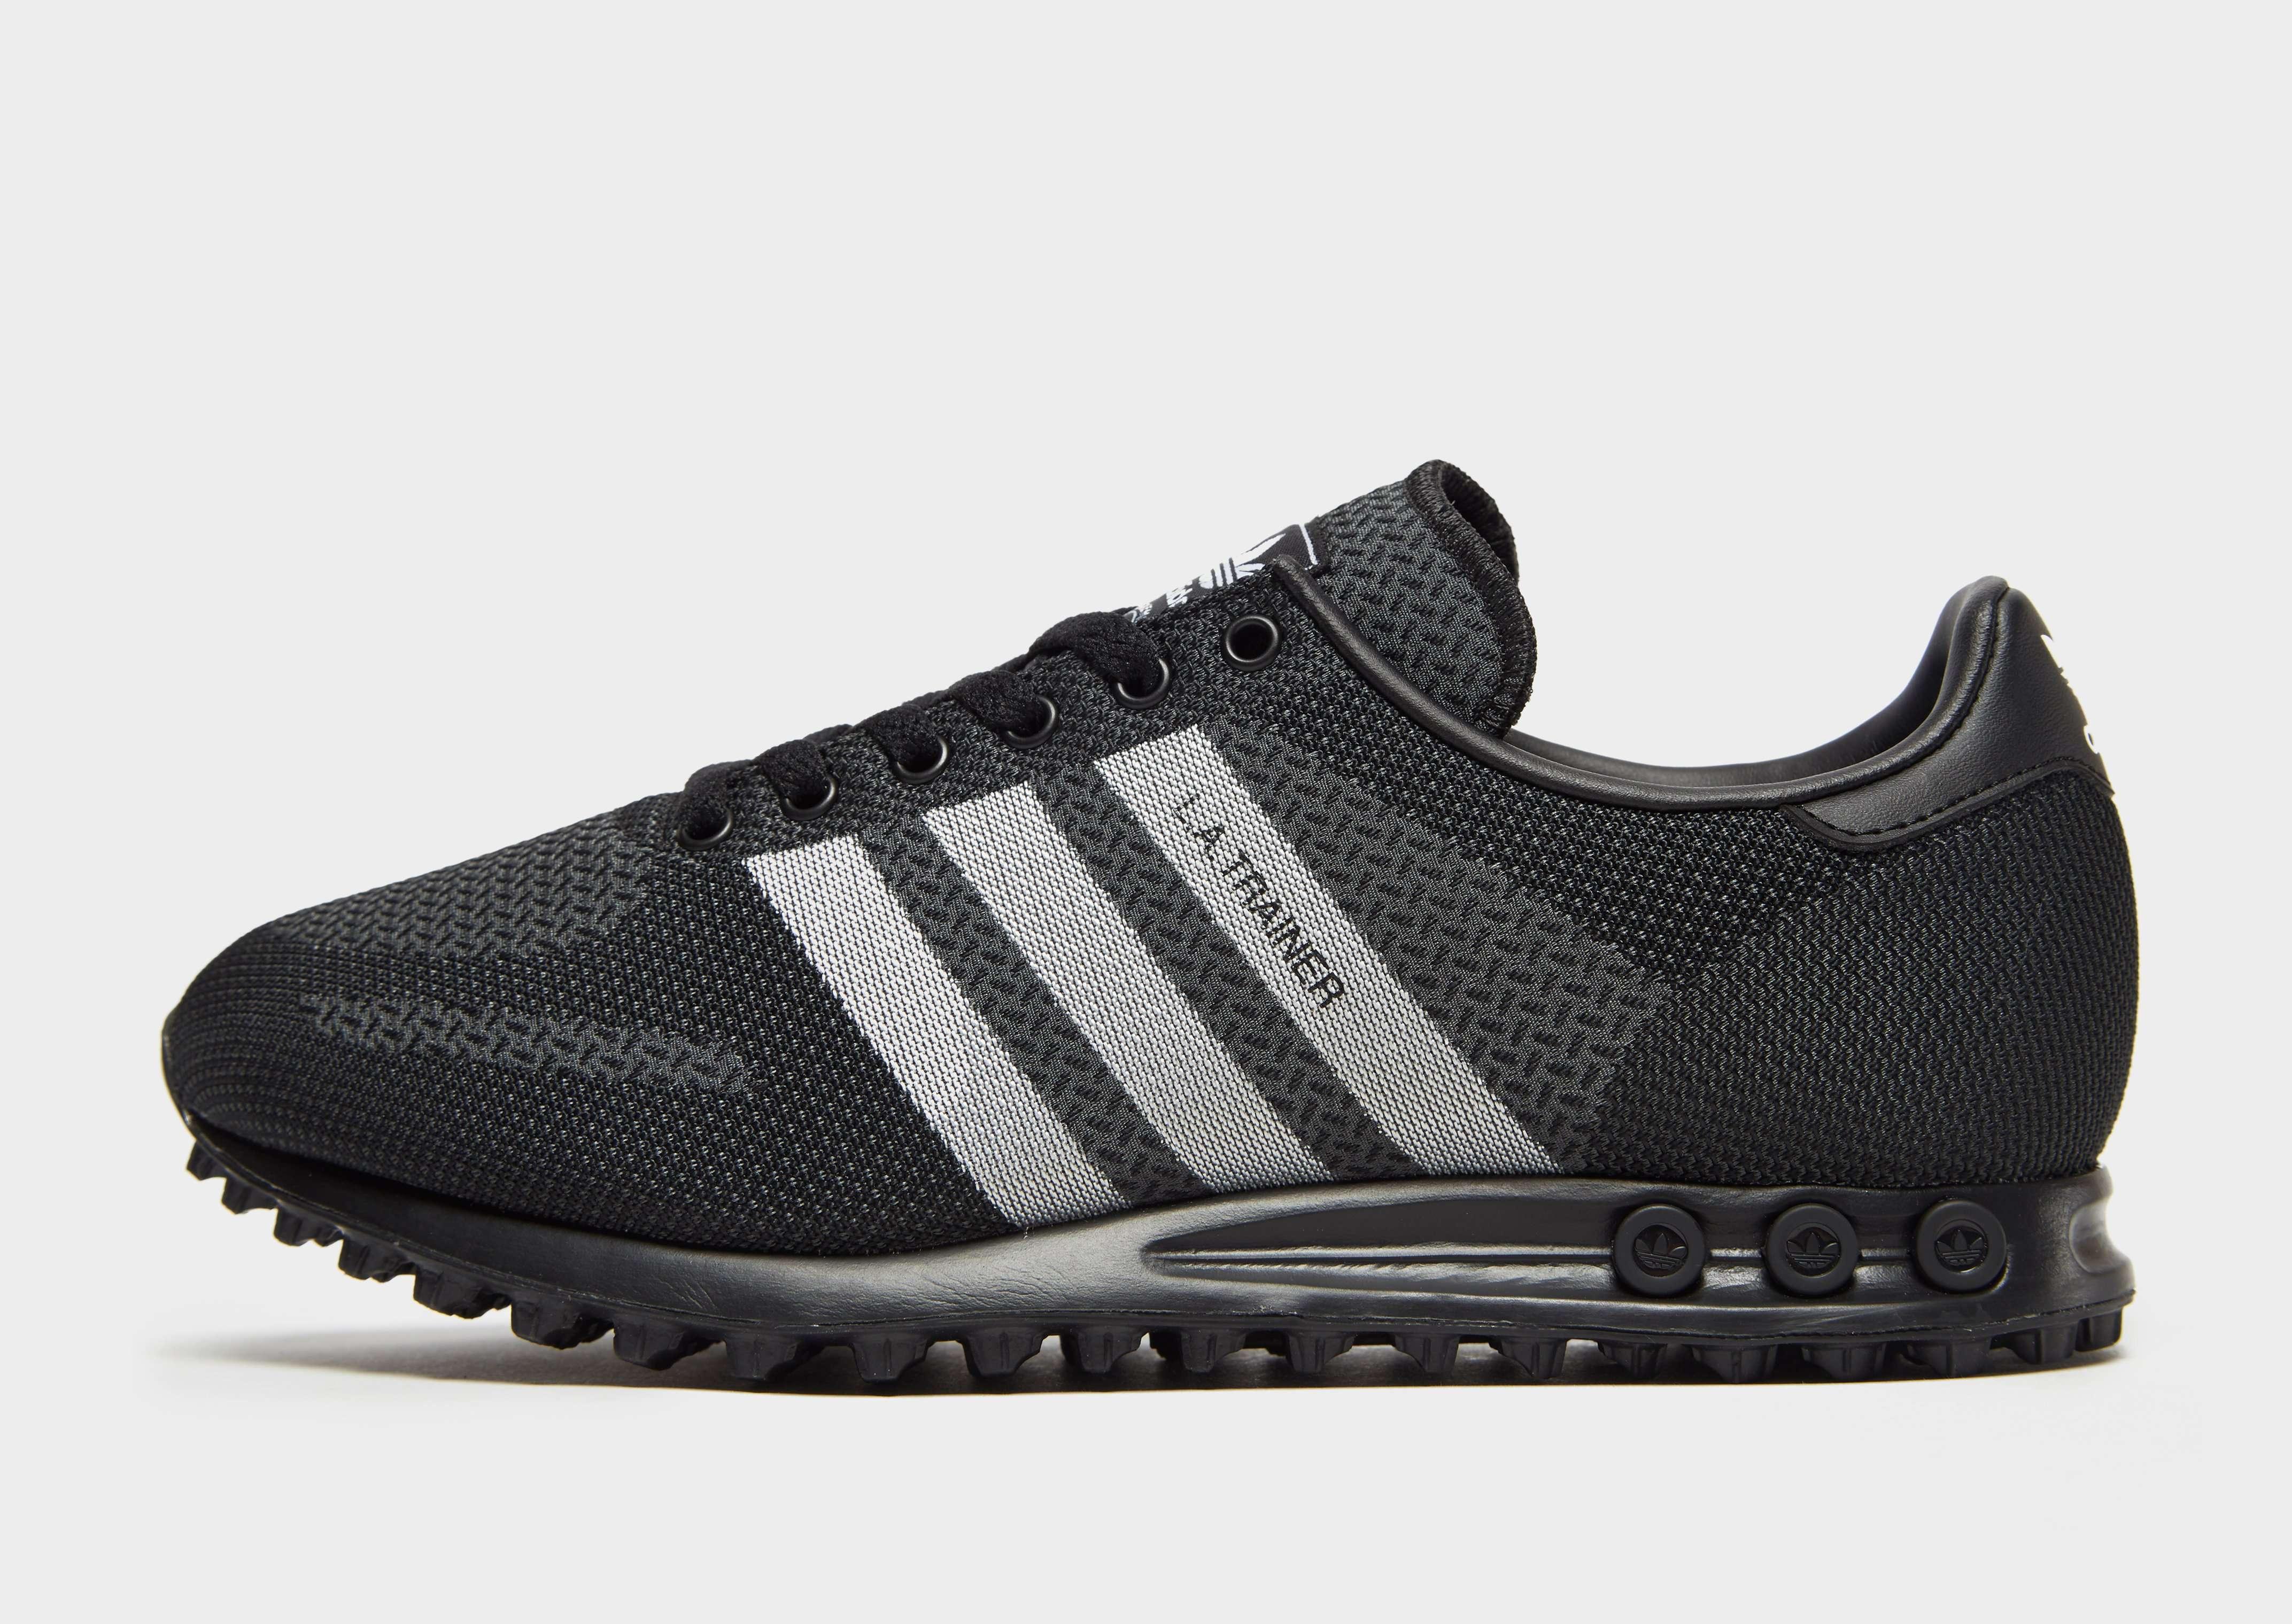 brand new 40da0 85287 Weave Originals Adidas La Sports Trainer Jd vYfwF4Zq